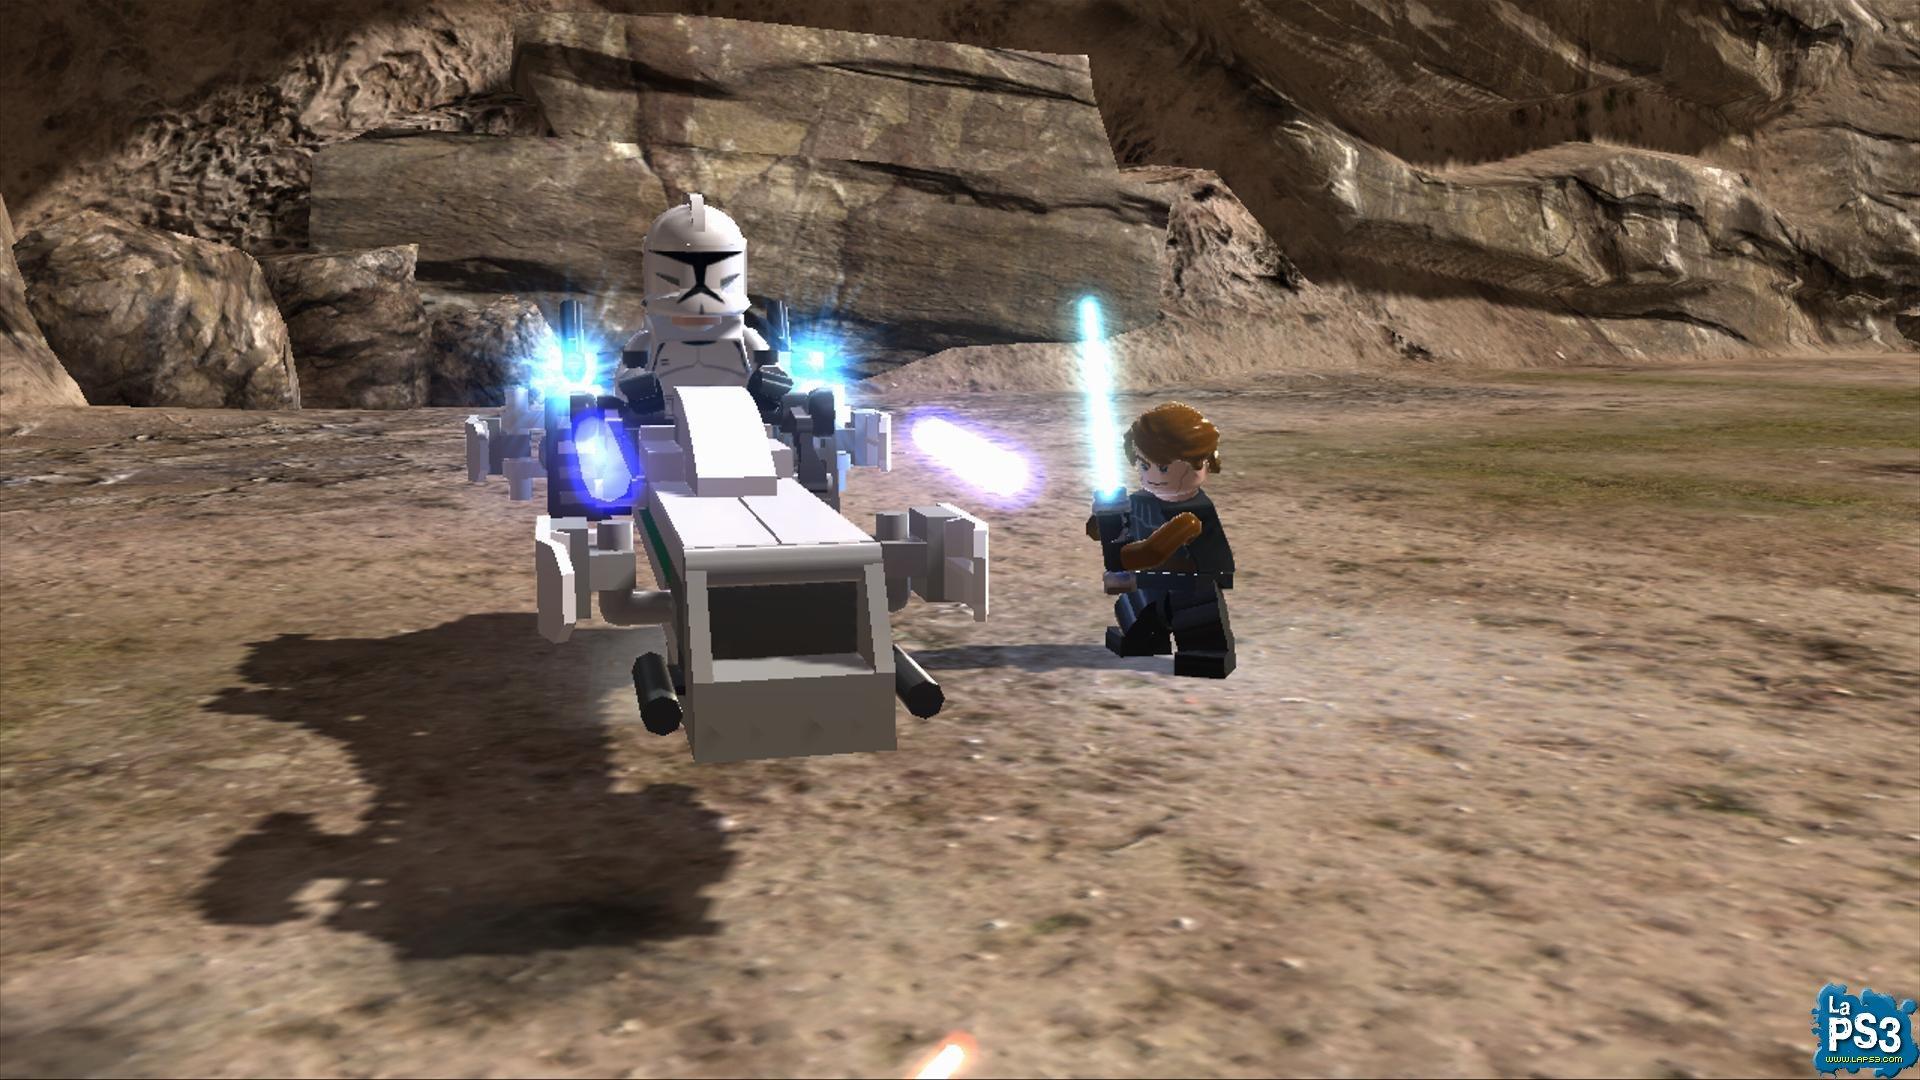 Lego Star Wars 3 The Clone Wars setup free download